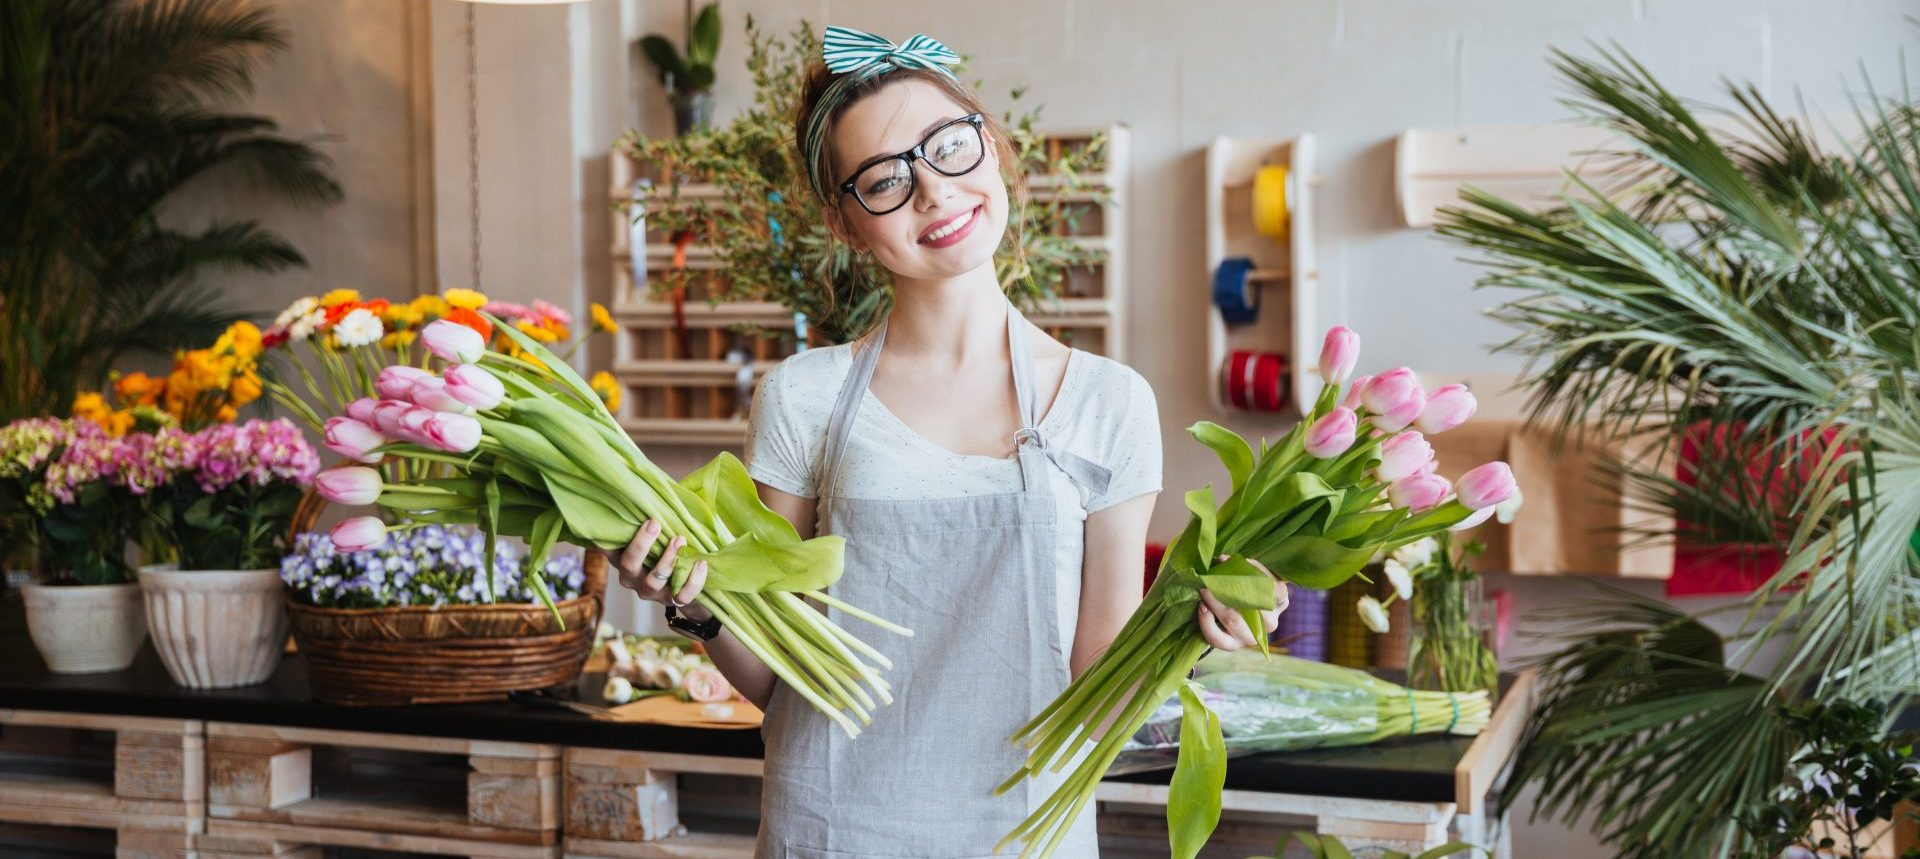 dame tulpen roze bloem bloemen plant sfeervol mooi lach